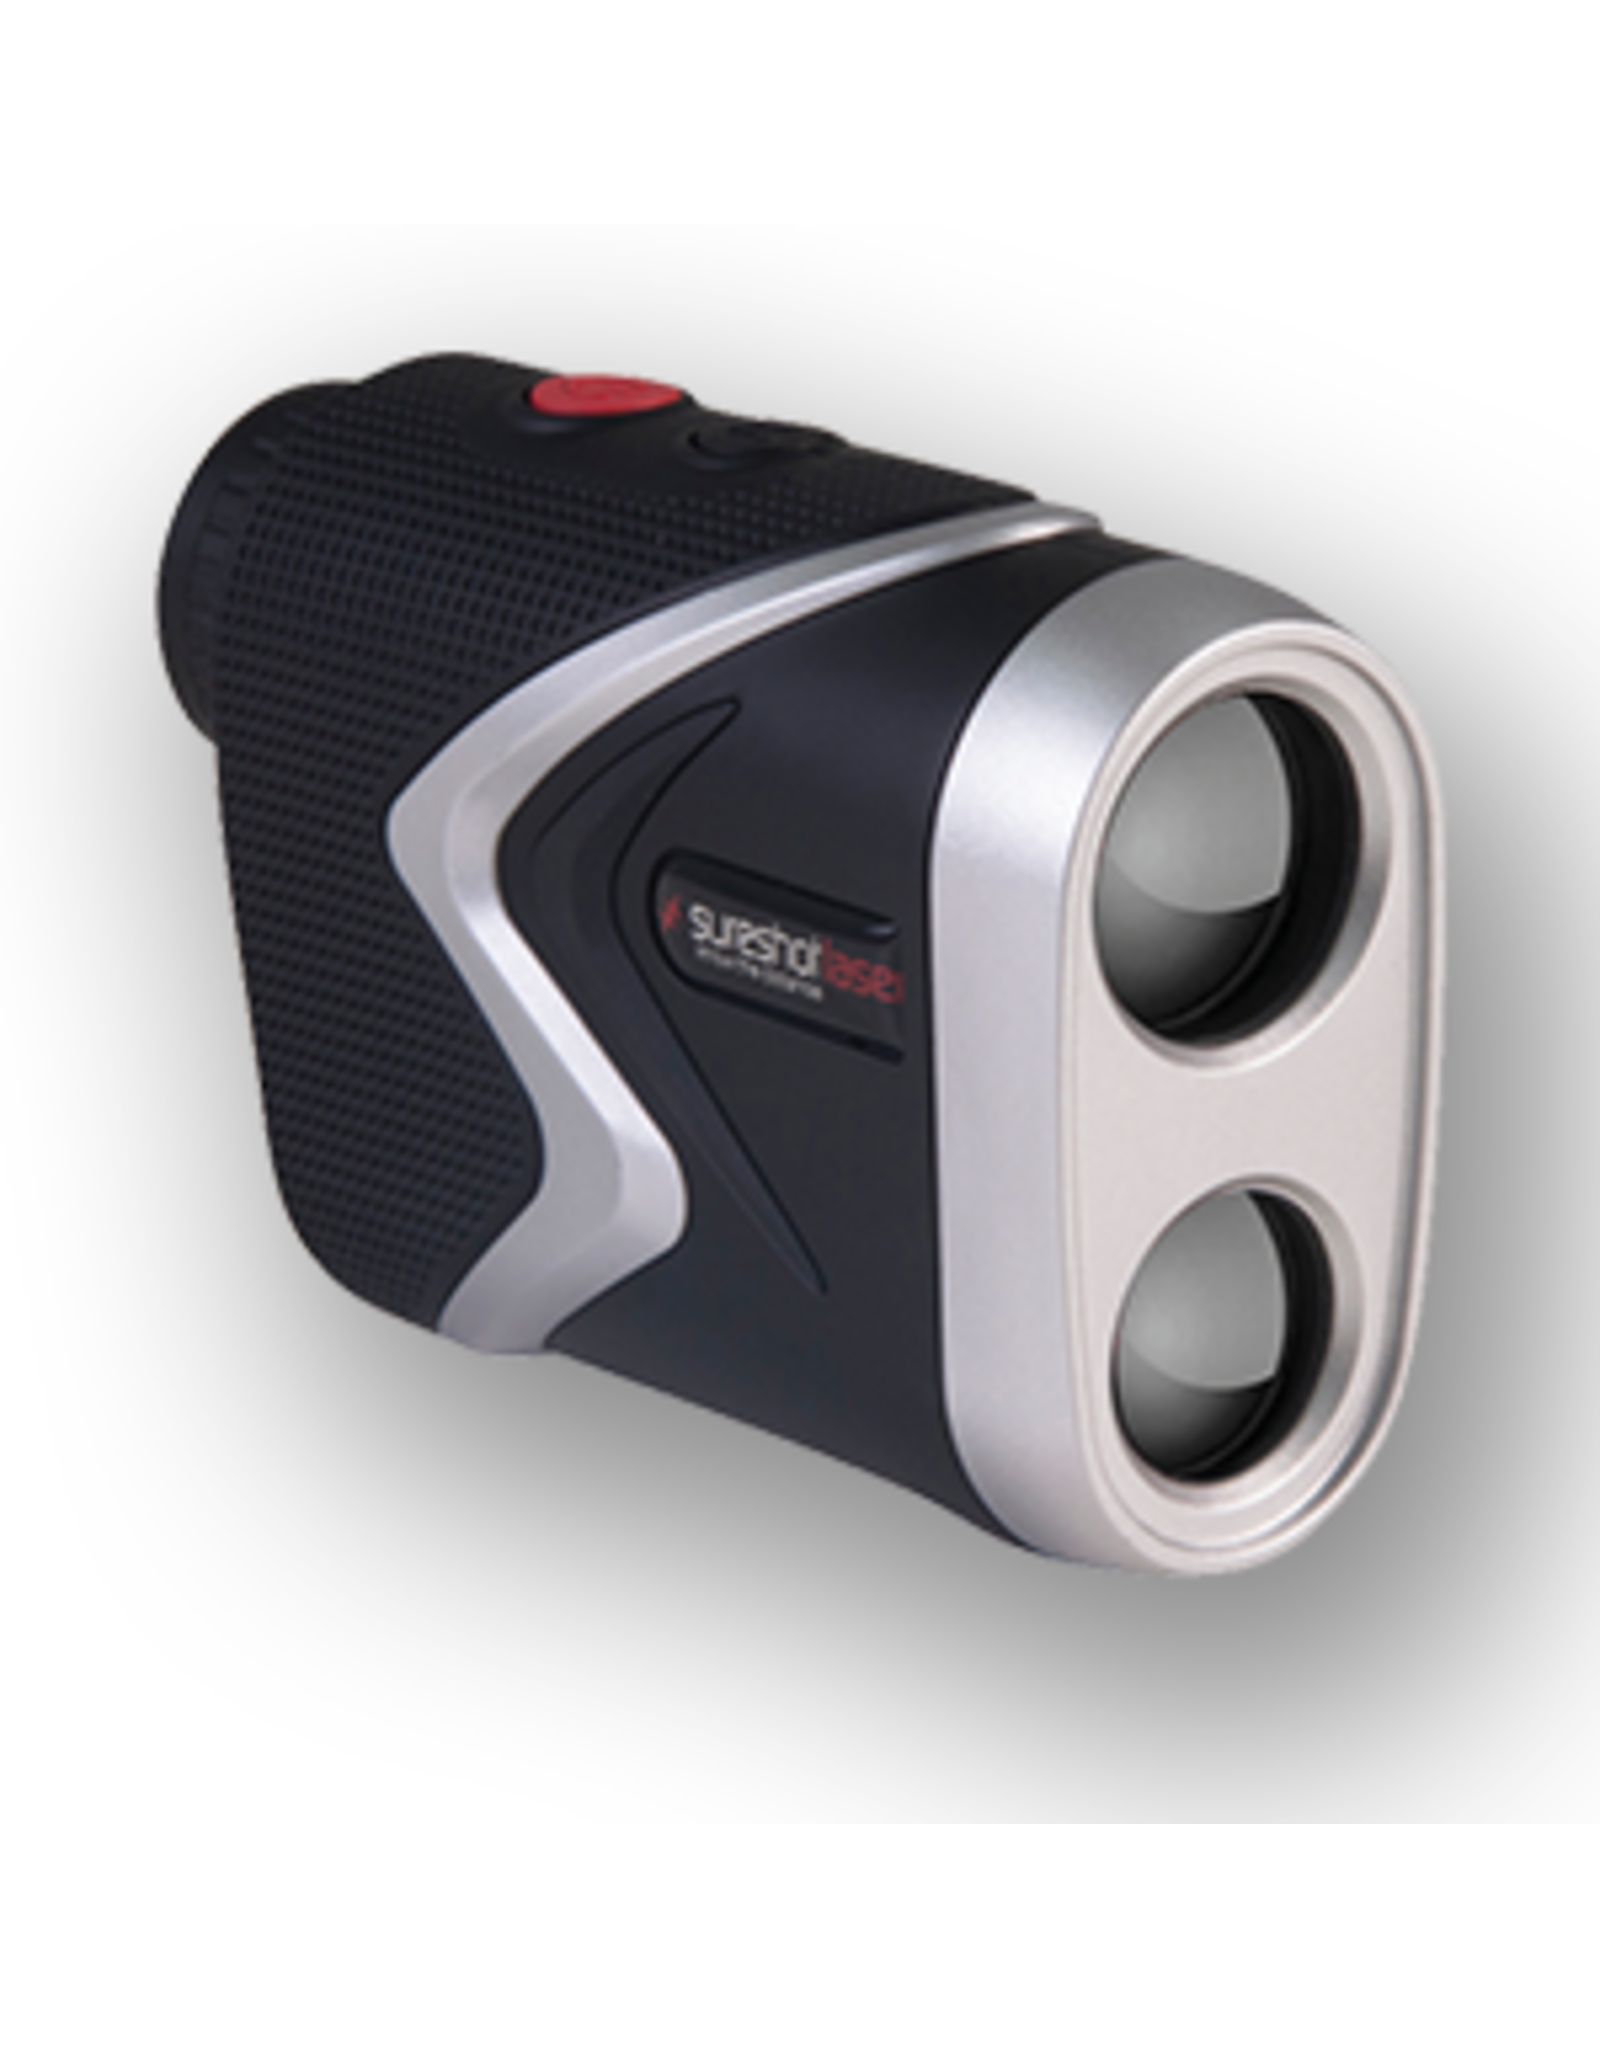 SureShot SureShot Pinloc 5000iP Rangefinder